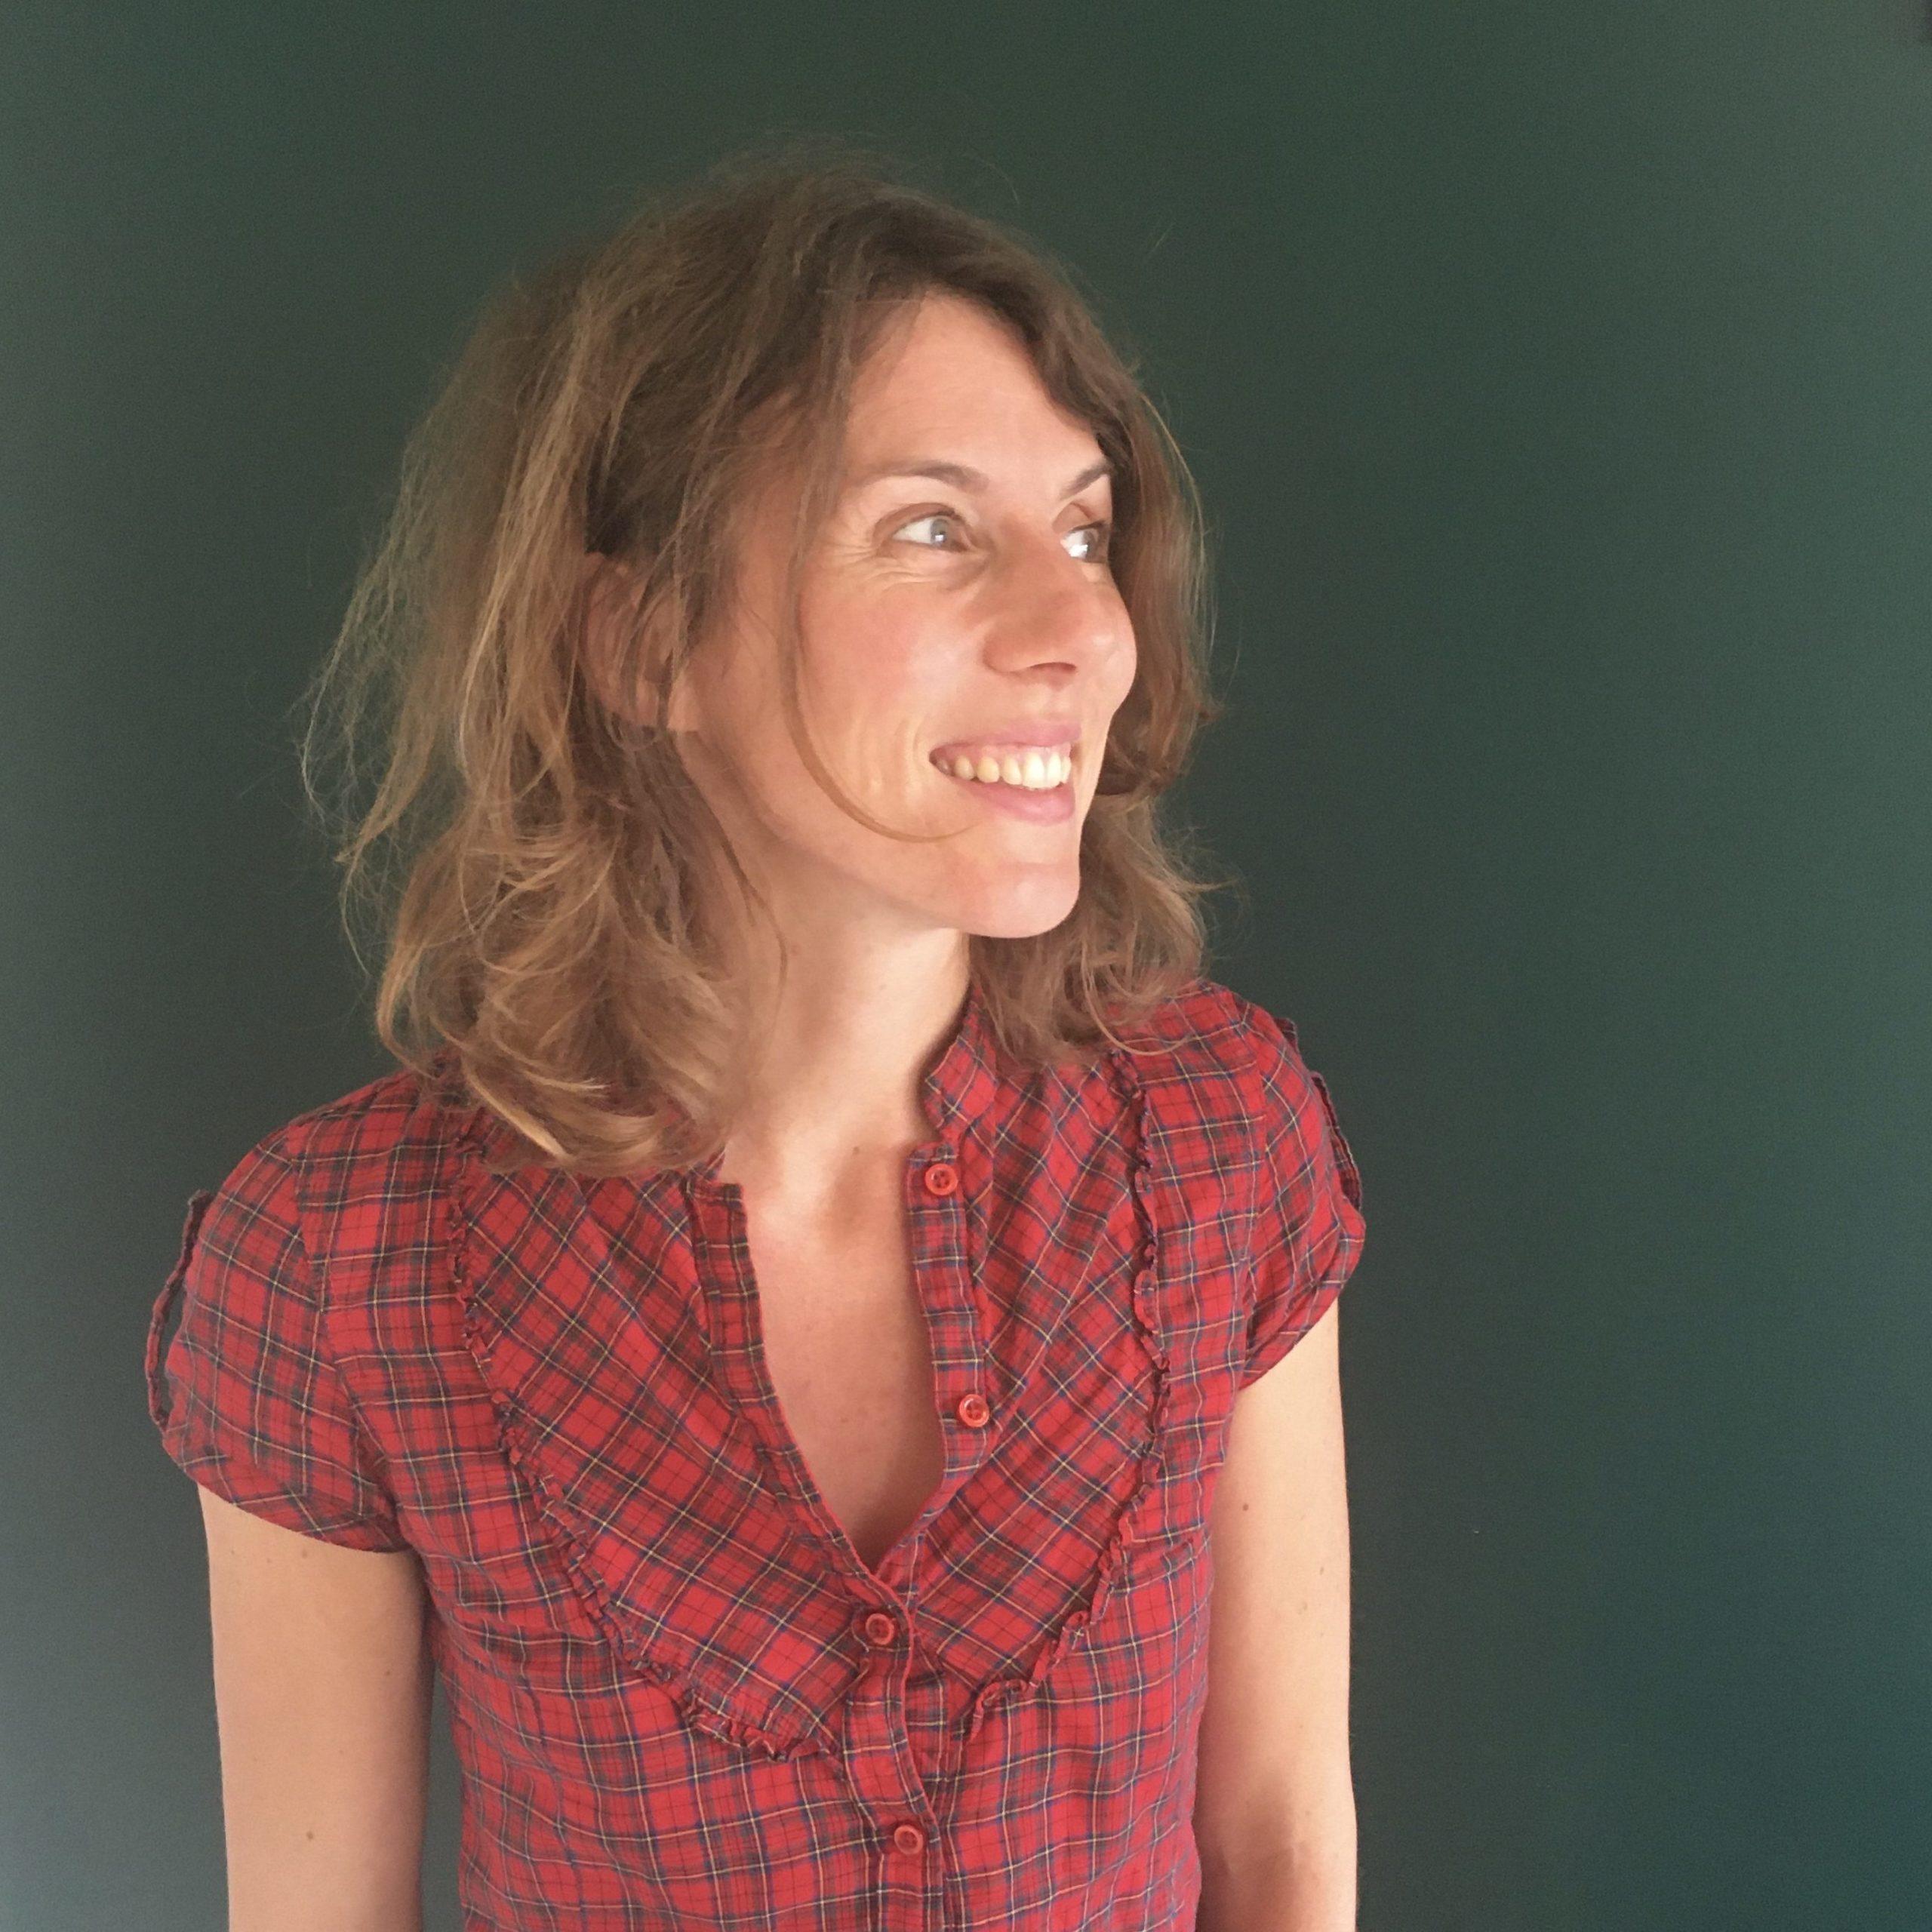 Mélanie Leblanc